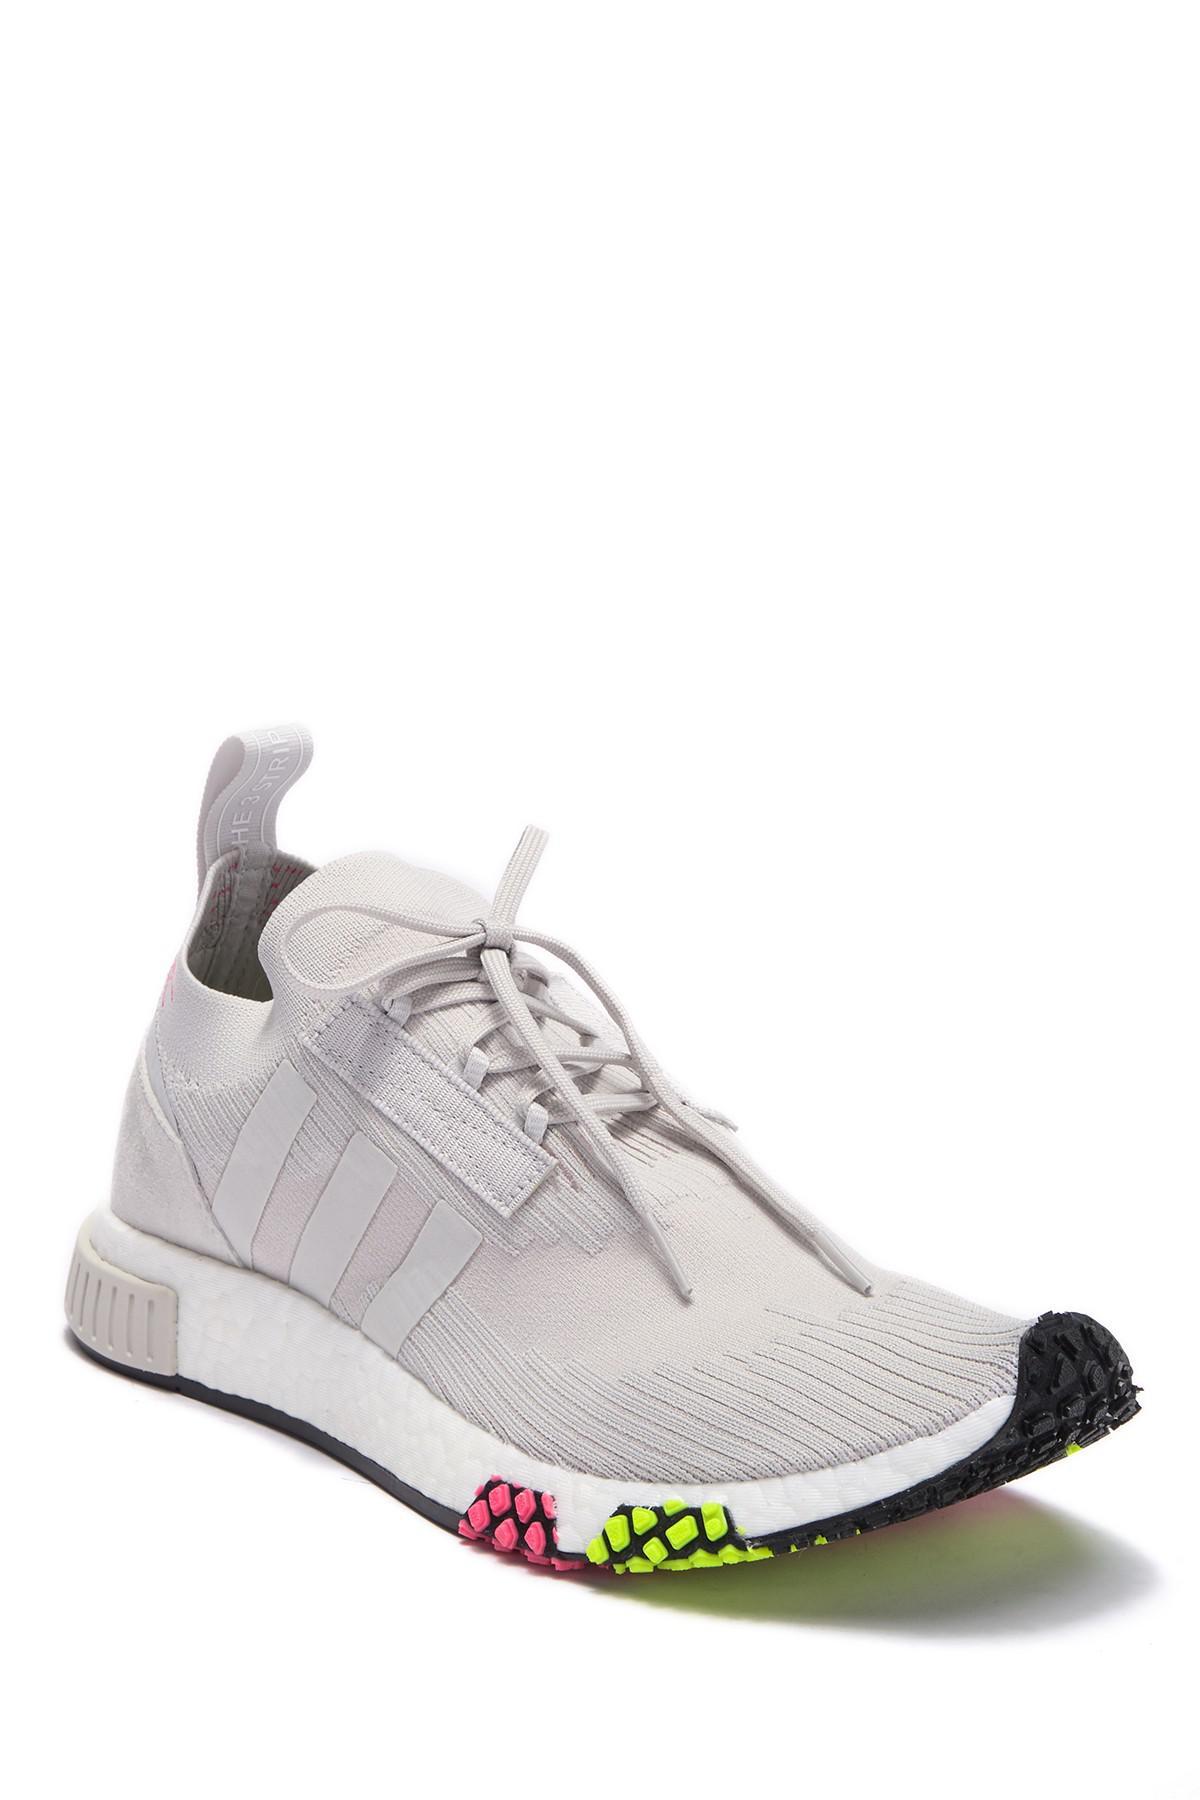 reputable site 1b28b dfeda adidas. Mens Nmd Racer Pk Athletic Sneaker